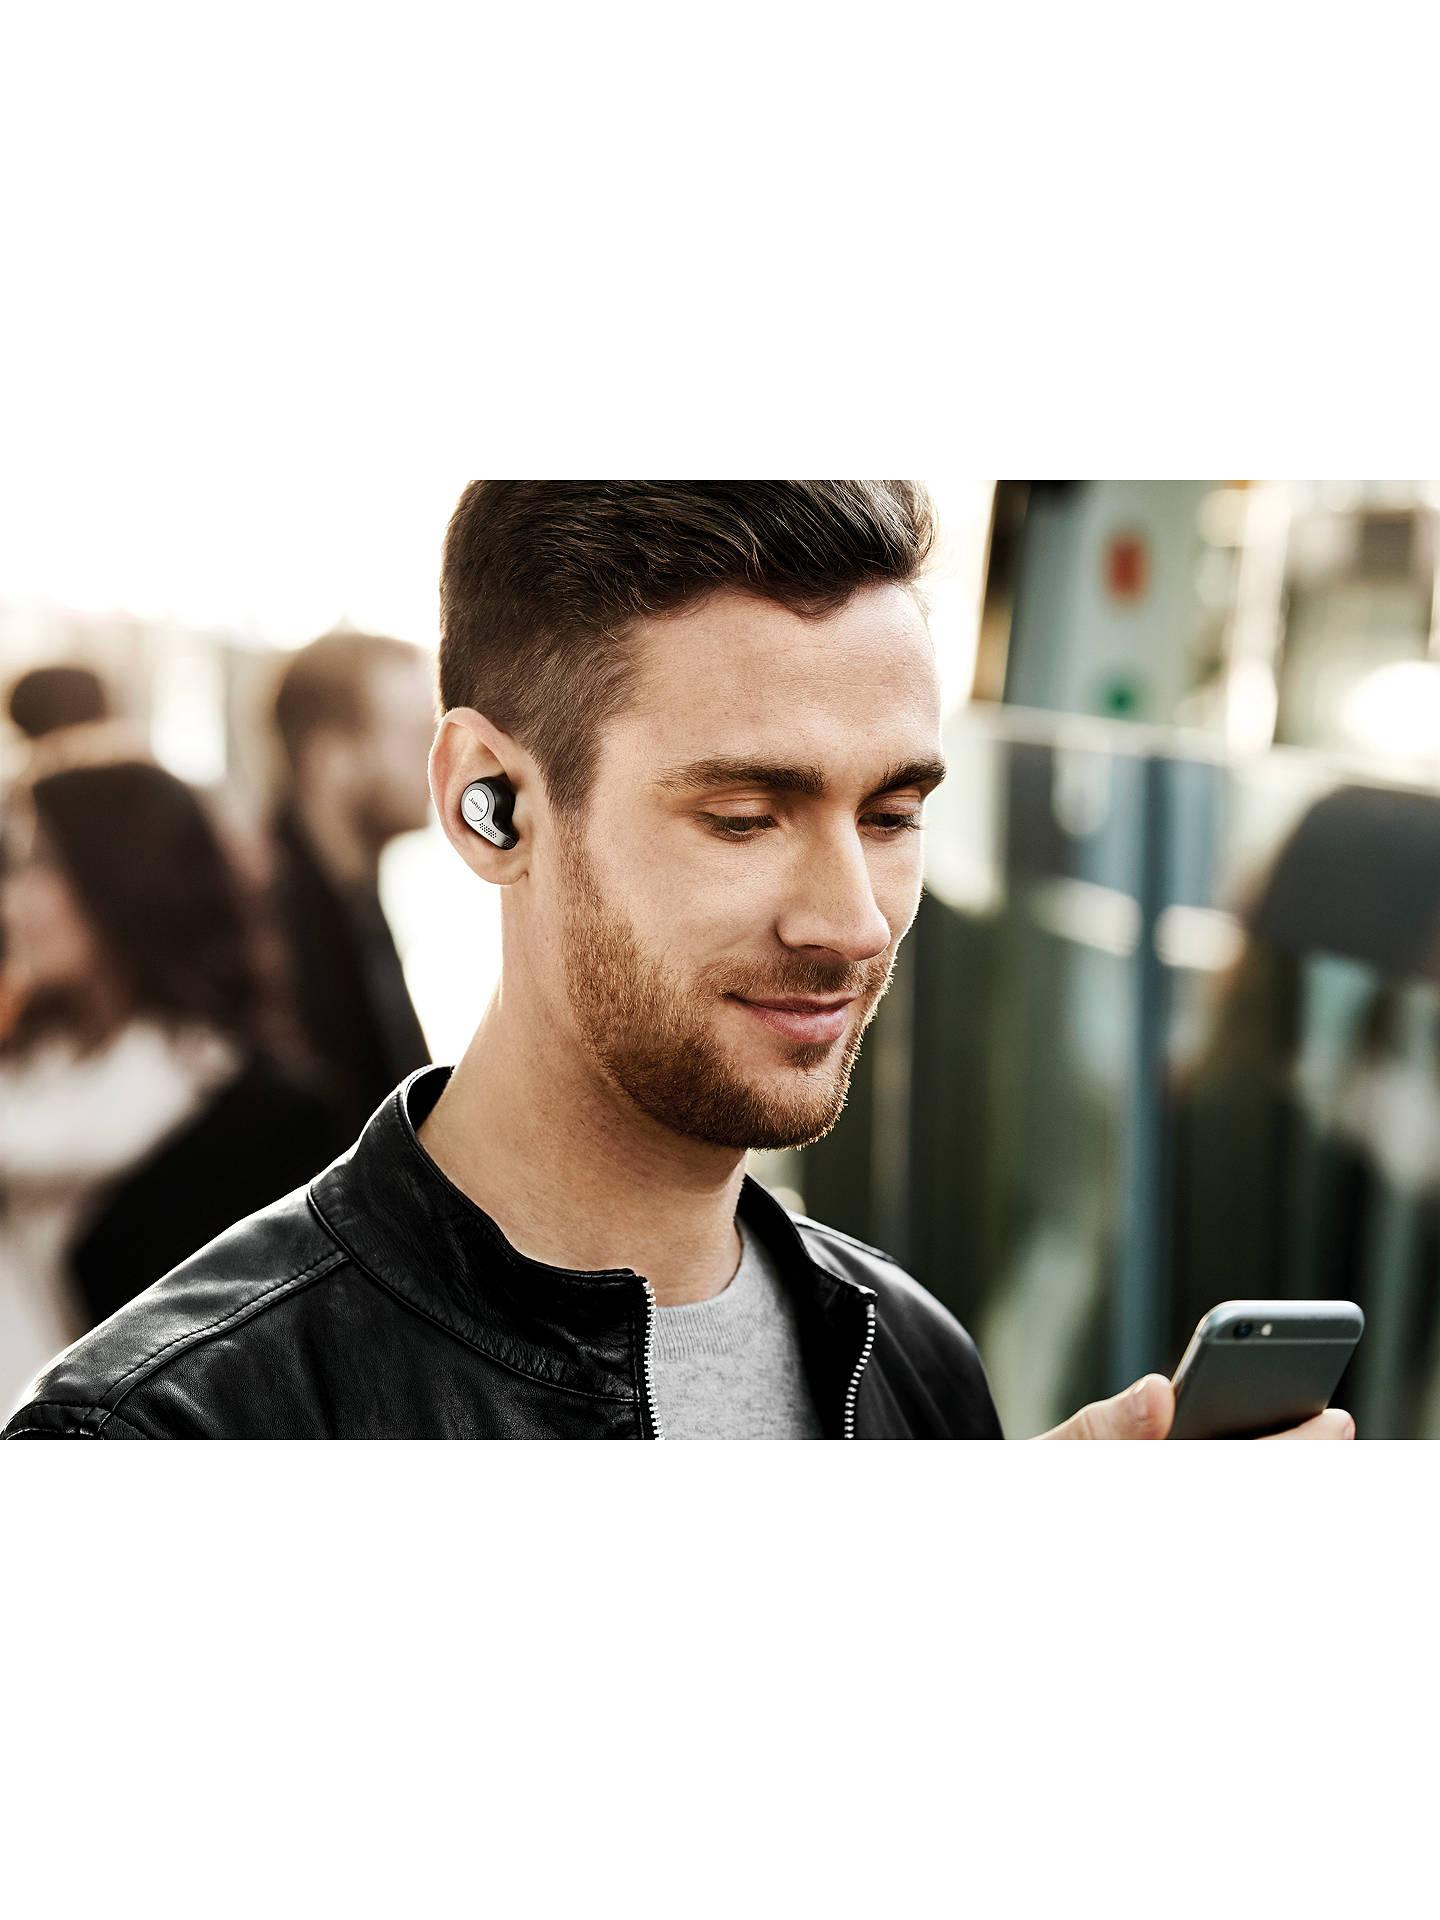 Jabra Elite 65t True Wireless Bluetooth In-Ear Headphones with Mic/Remote,  Black